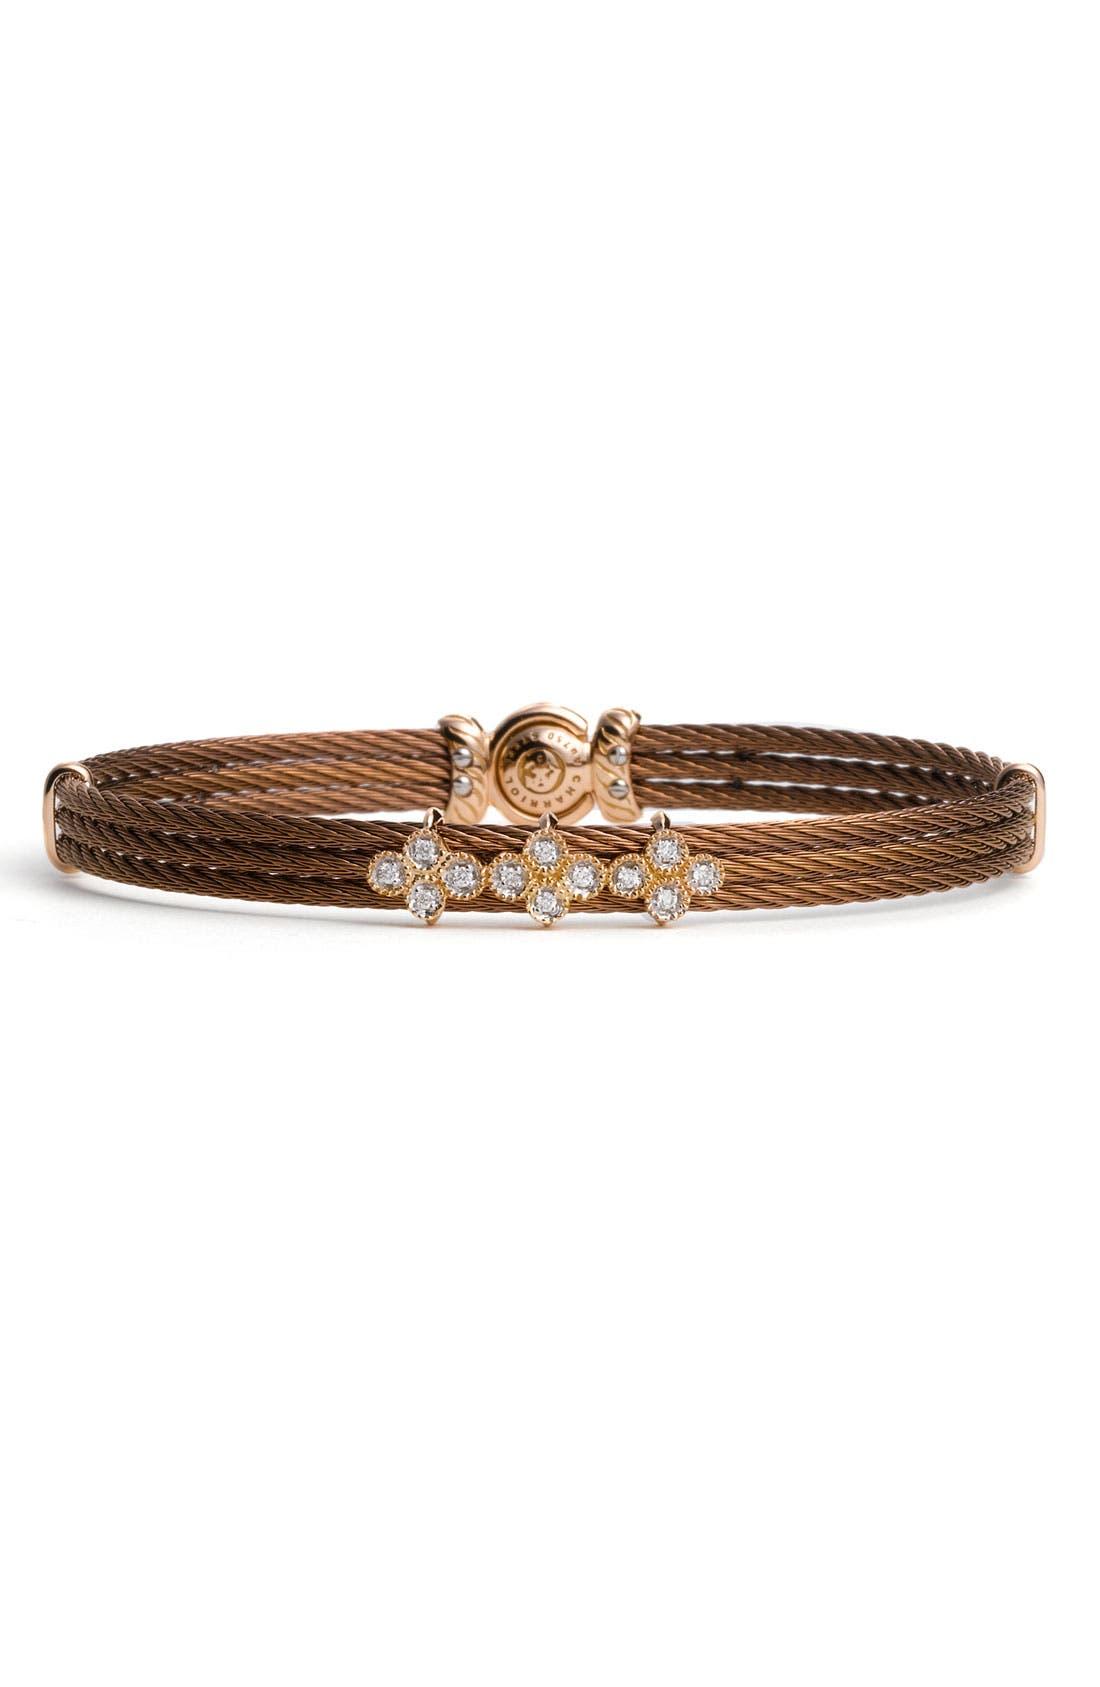 Main Image - ALOR® Gold, Diamond & Bronze Bracelet